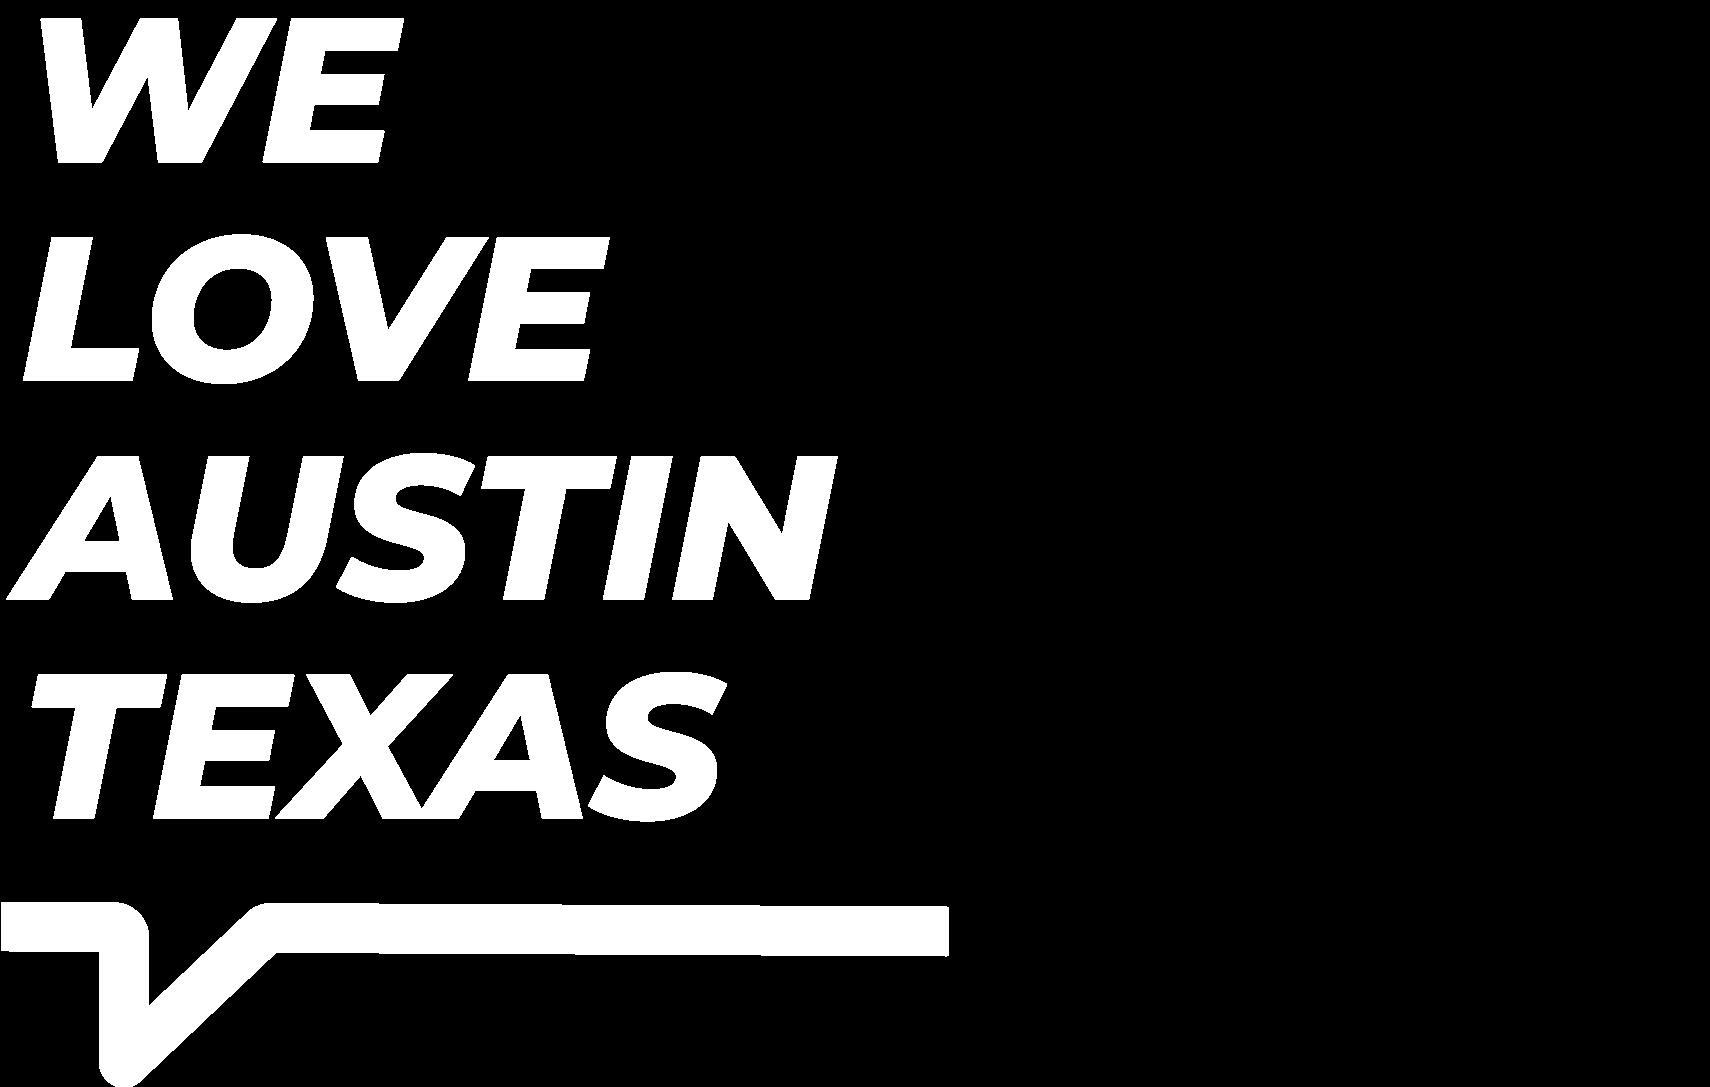 Austin Root Canal - Root Canal Austin - Austin Endodontist - Austin Endodontics Provider - Endodontic Associates of Austin - Endodontist Austin TX